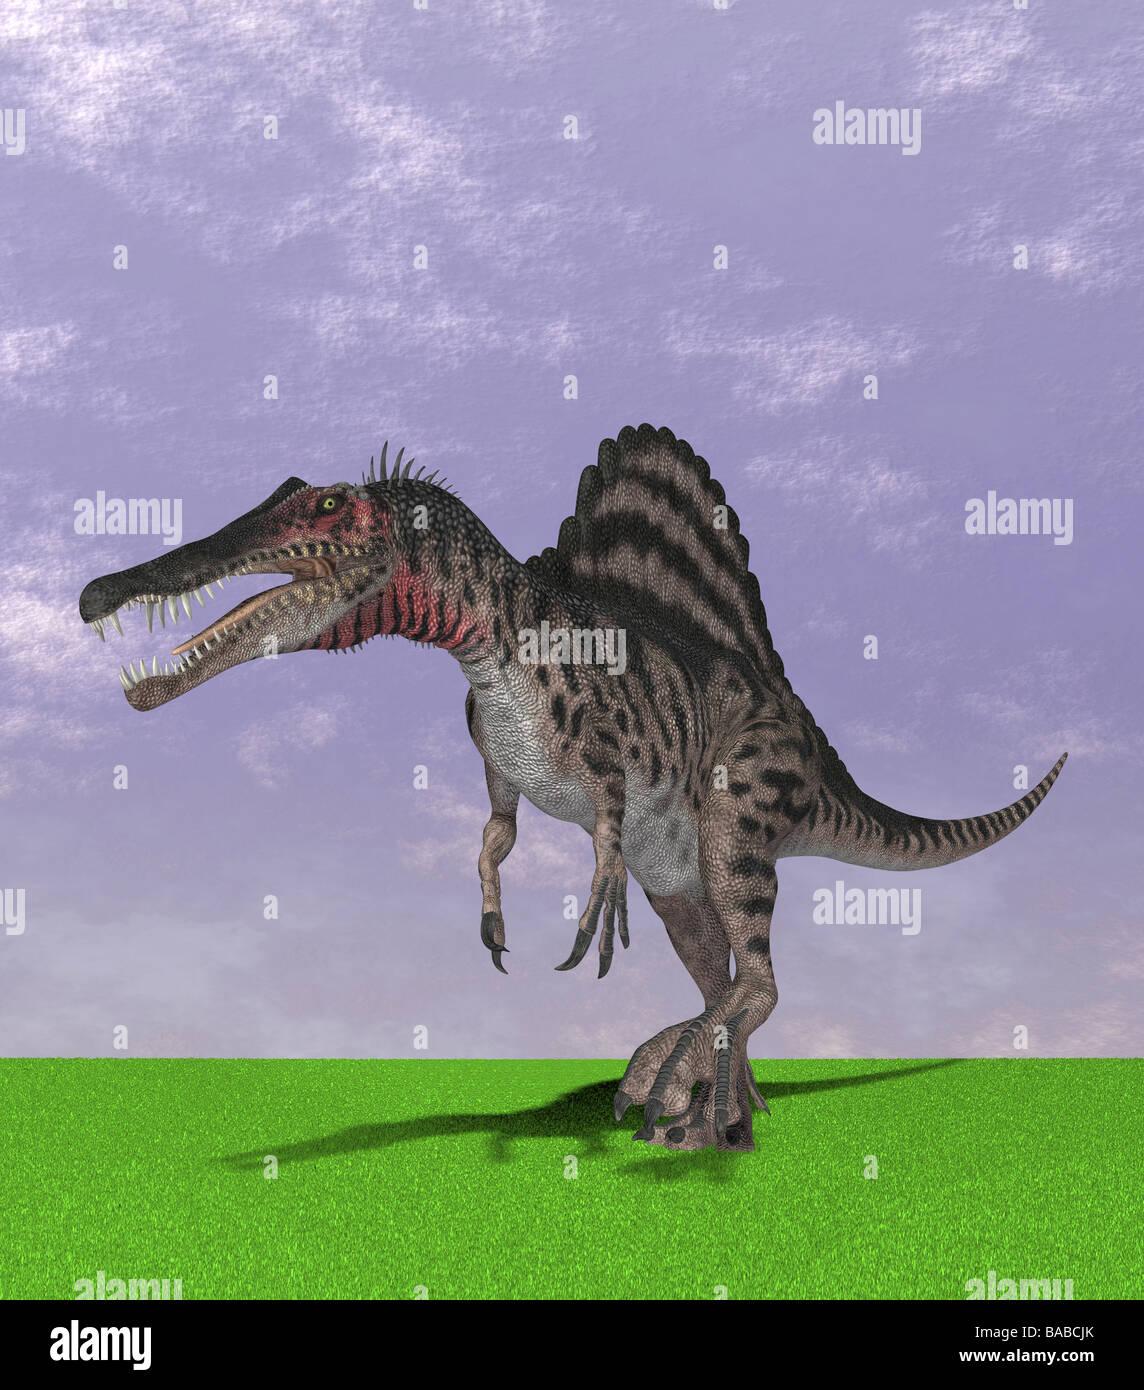 Spinosaurus Stock Photos & Spinosaurus Stock Images - Alamy